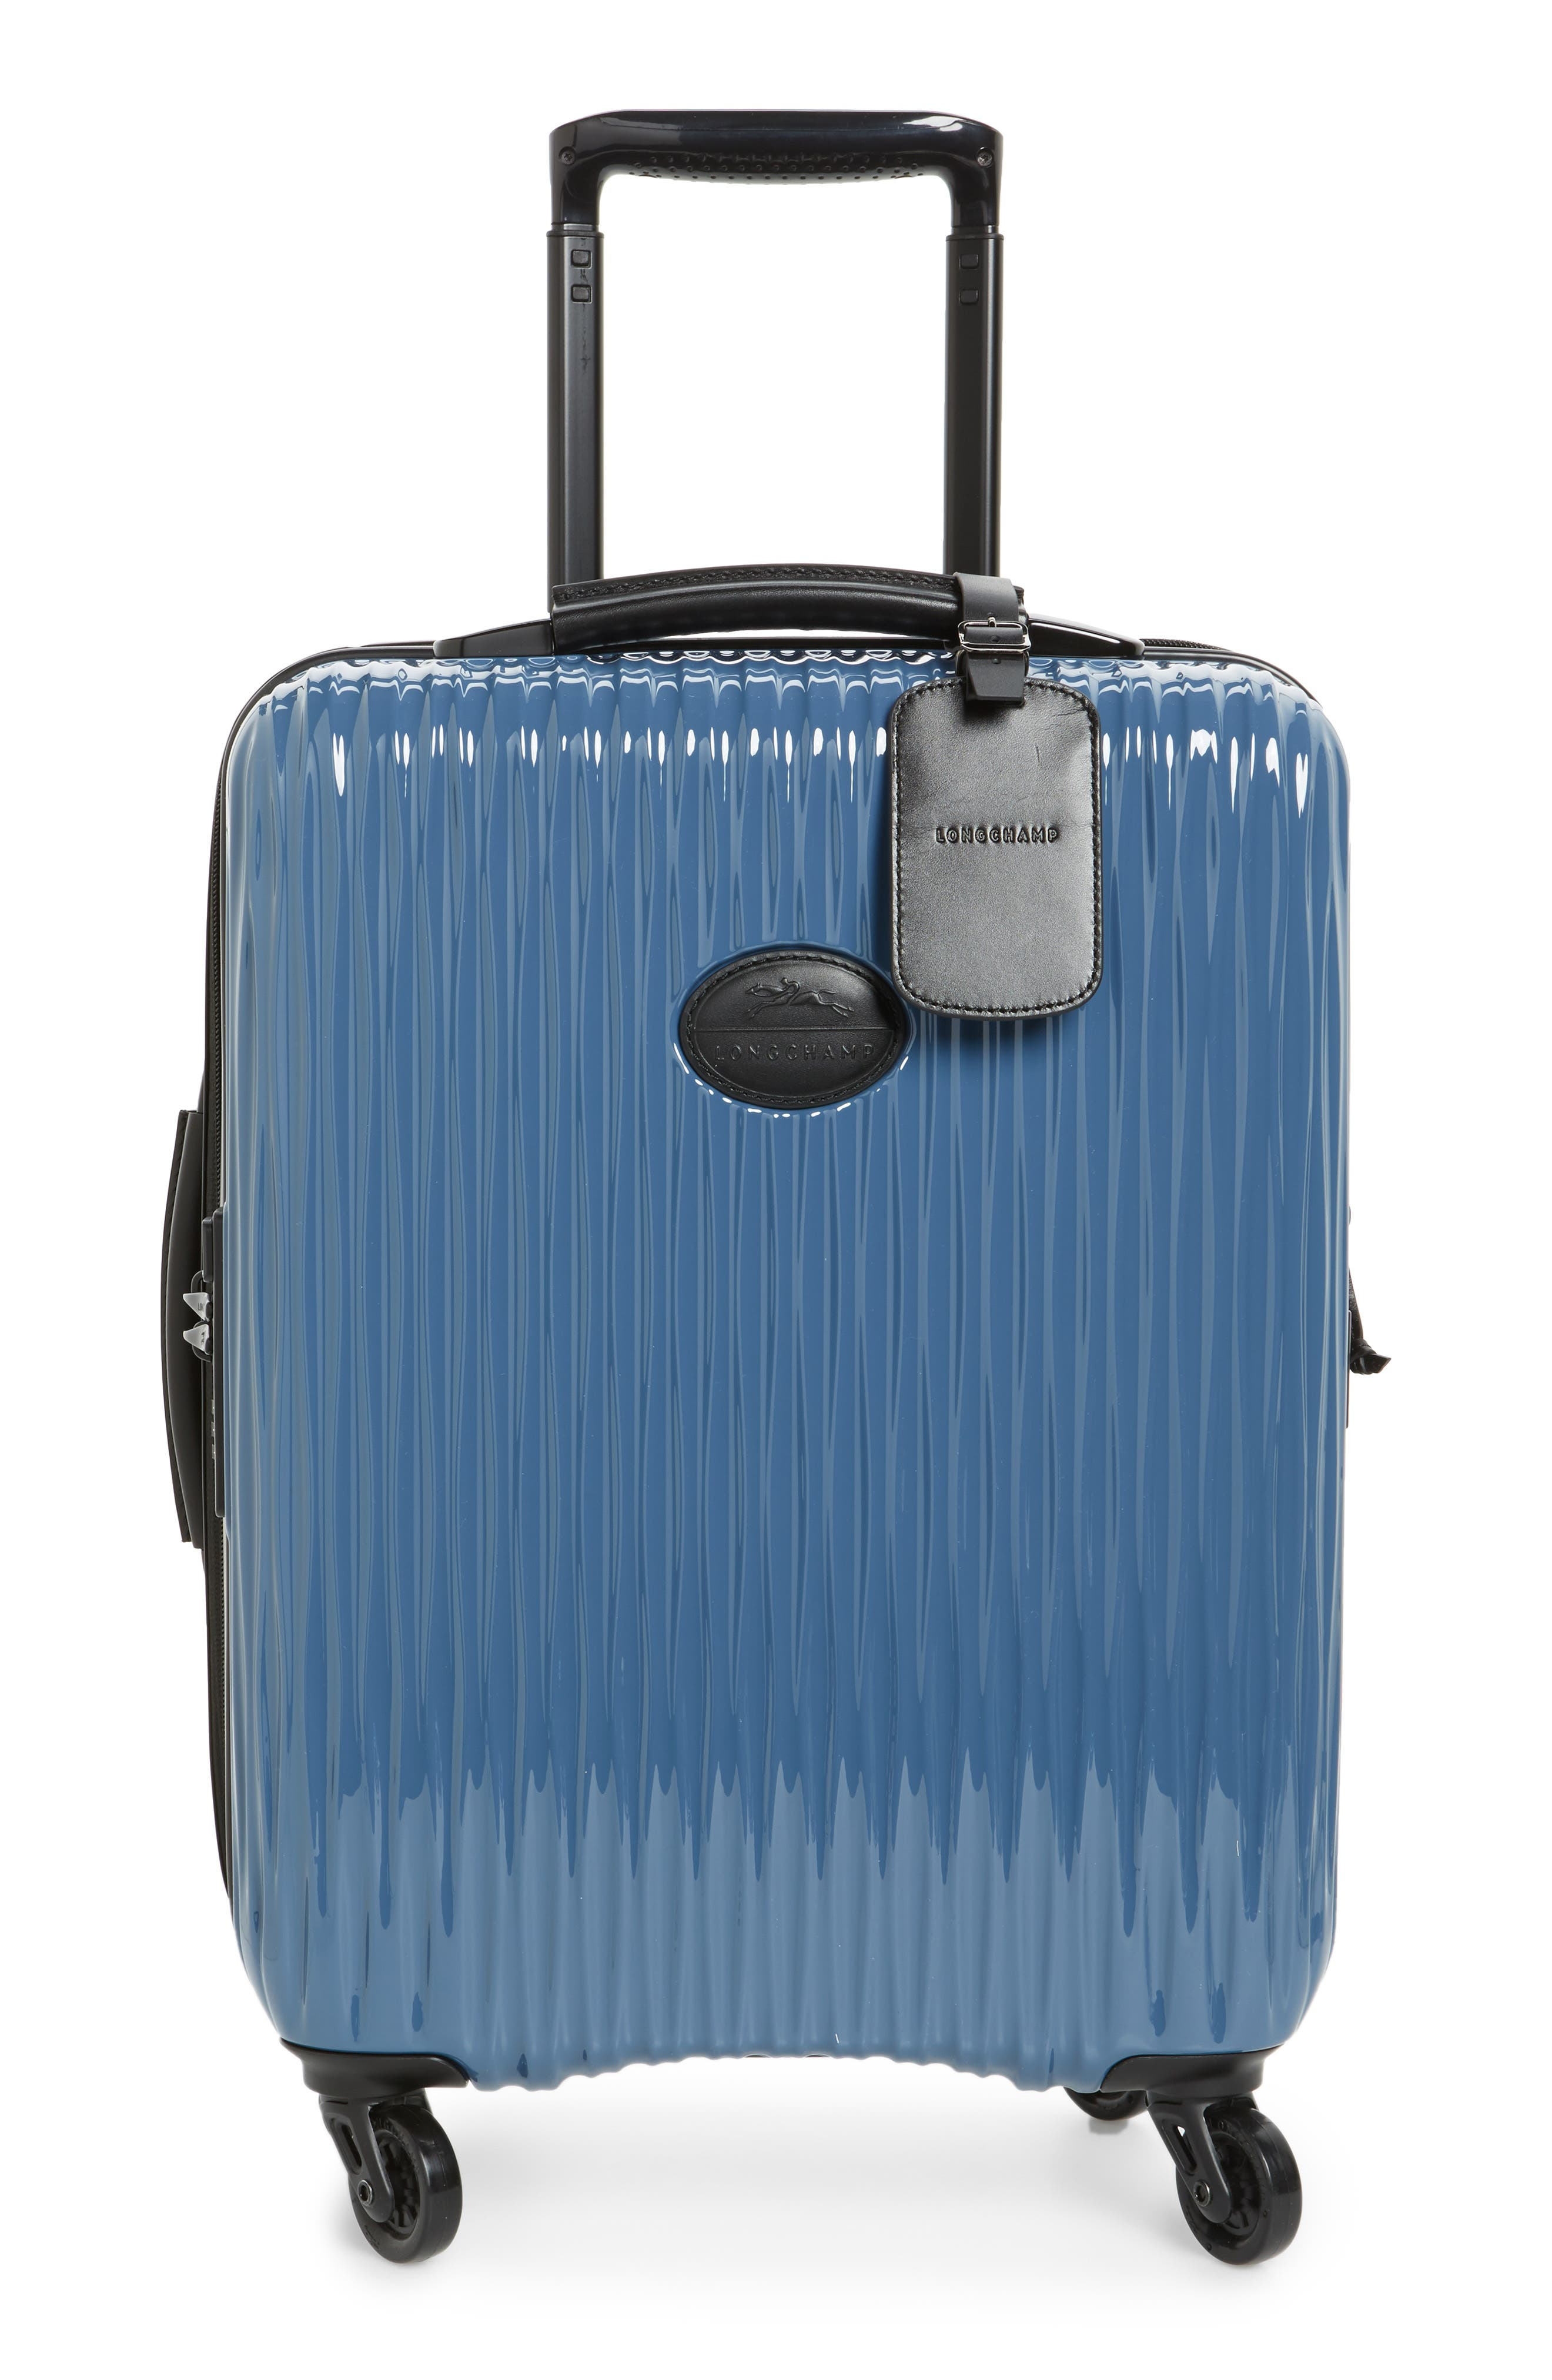 Ruban 22-Inch Four-Wheel Hard Shell Suitcase,                             Main thumbnail 1, color,                             Blk/ Pilblue